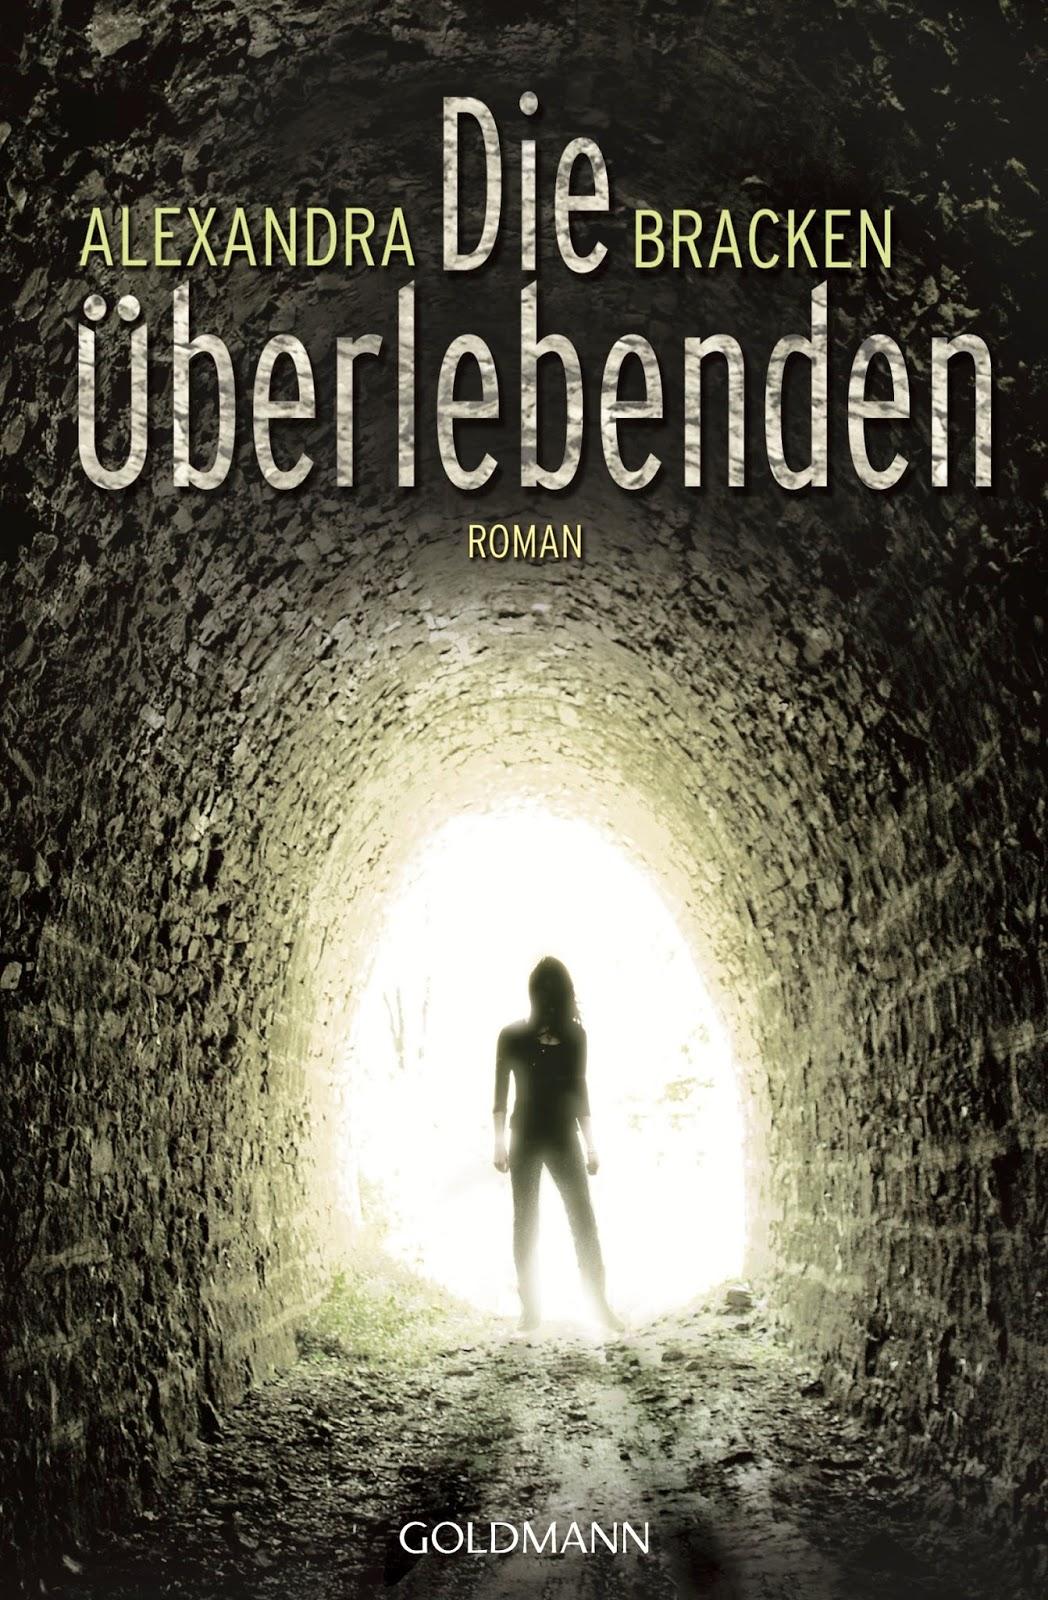 http://www.randomhouse.de/content/edition/covervoila_hires/Bracken_ADie_Ueberlebenden_142559.jpg